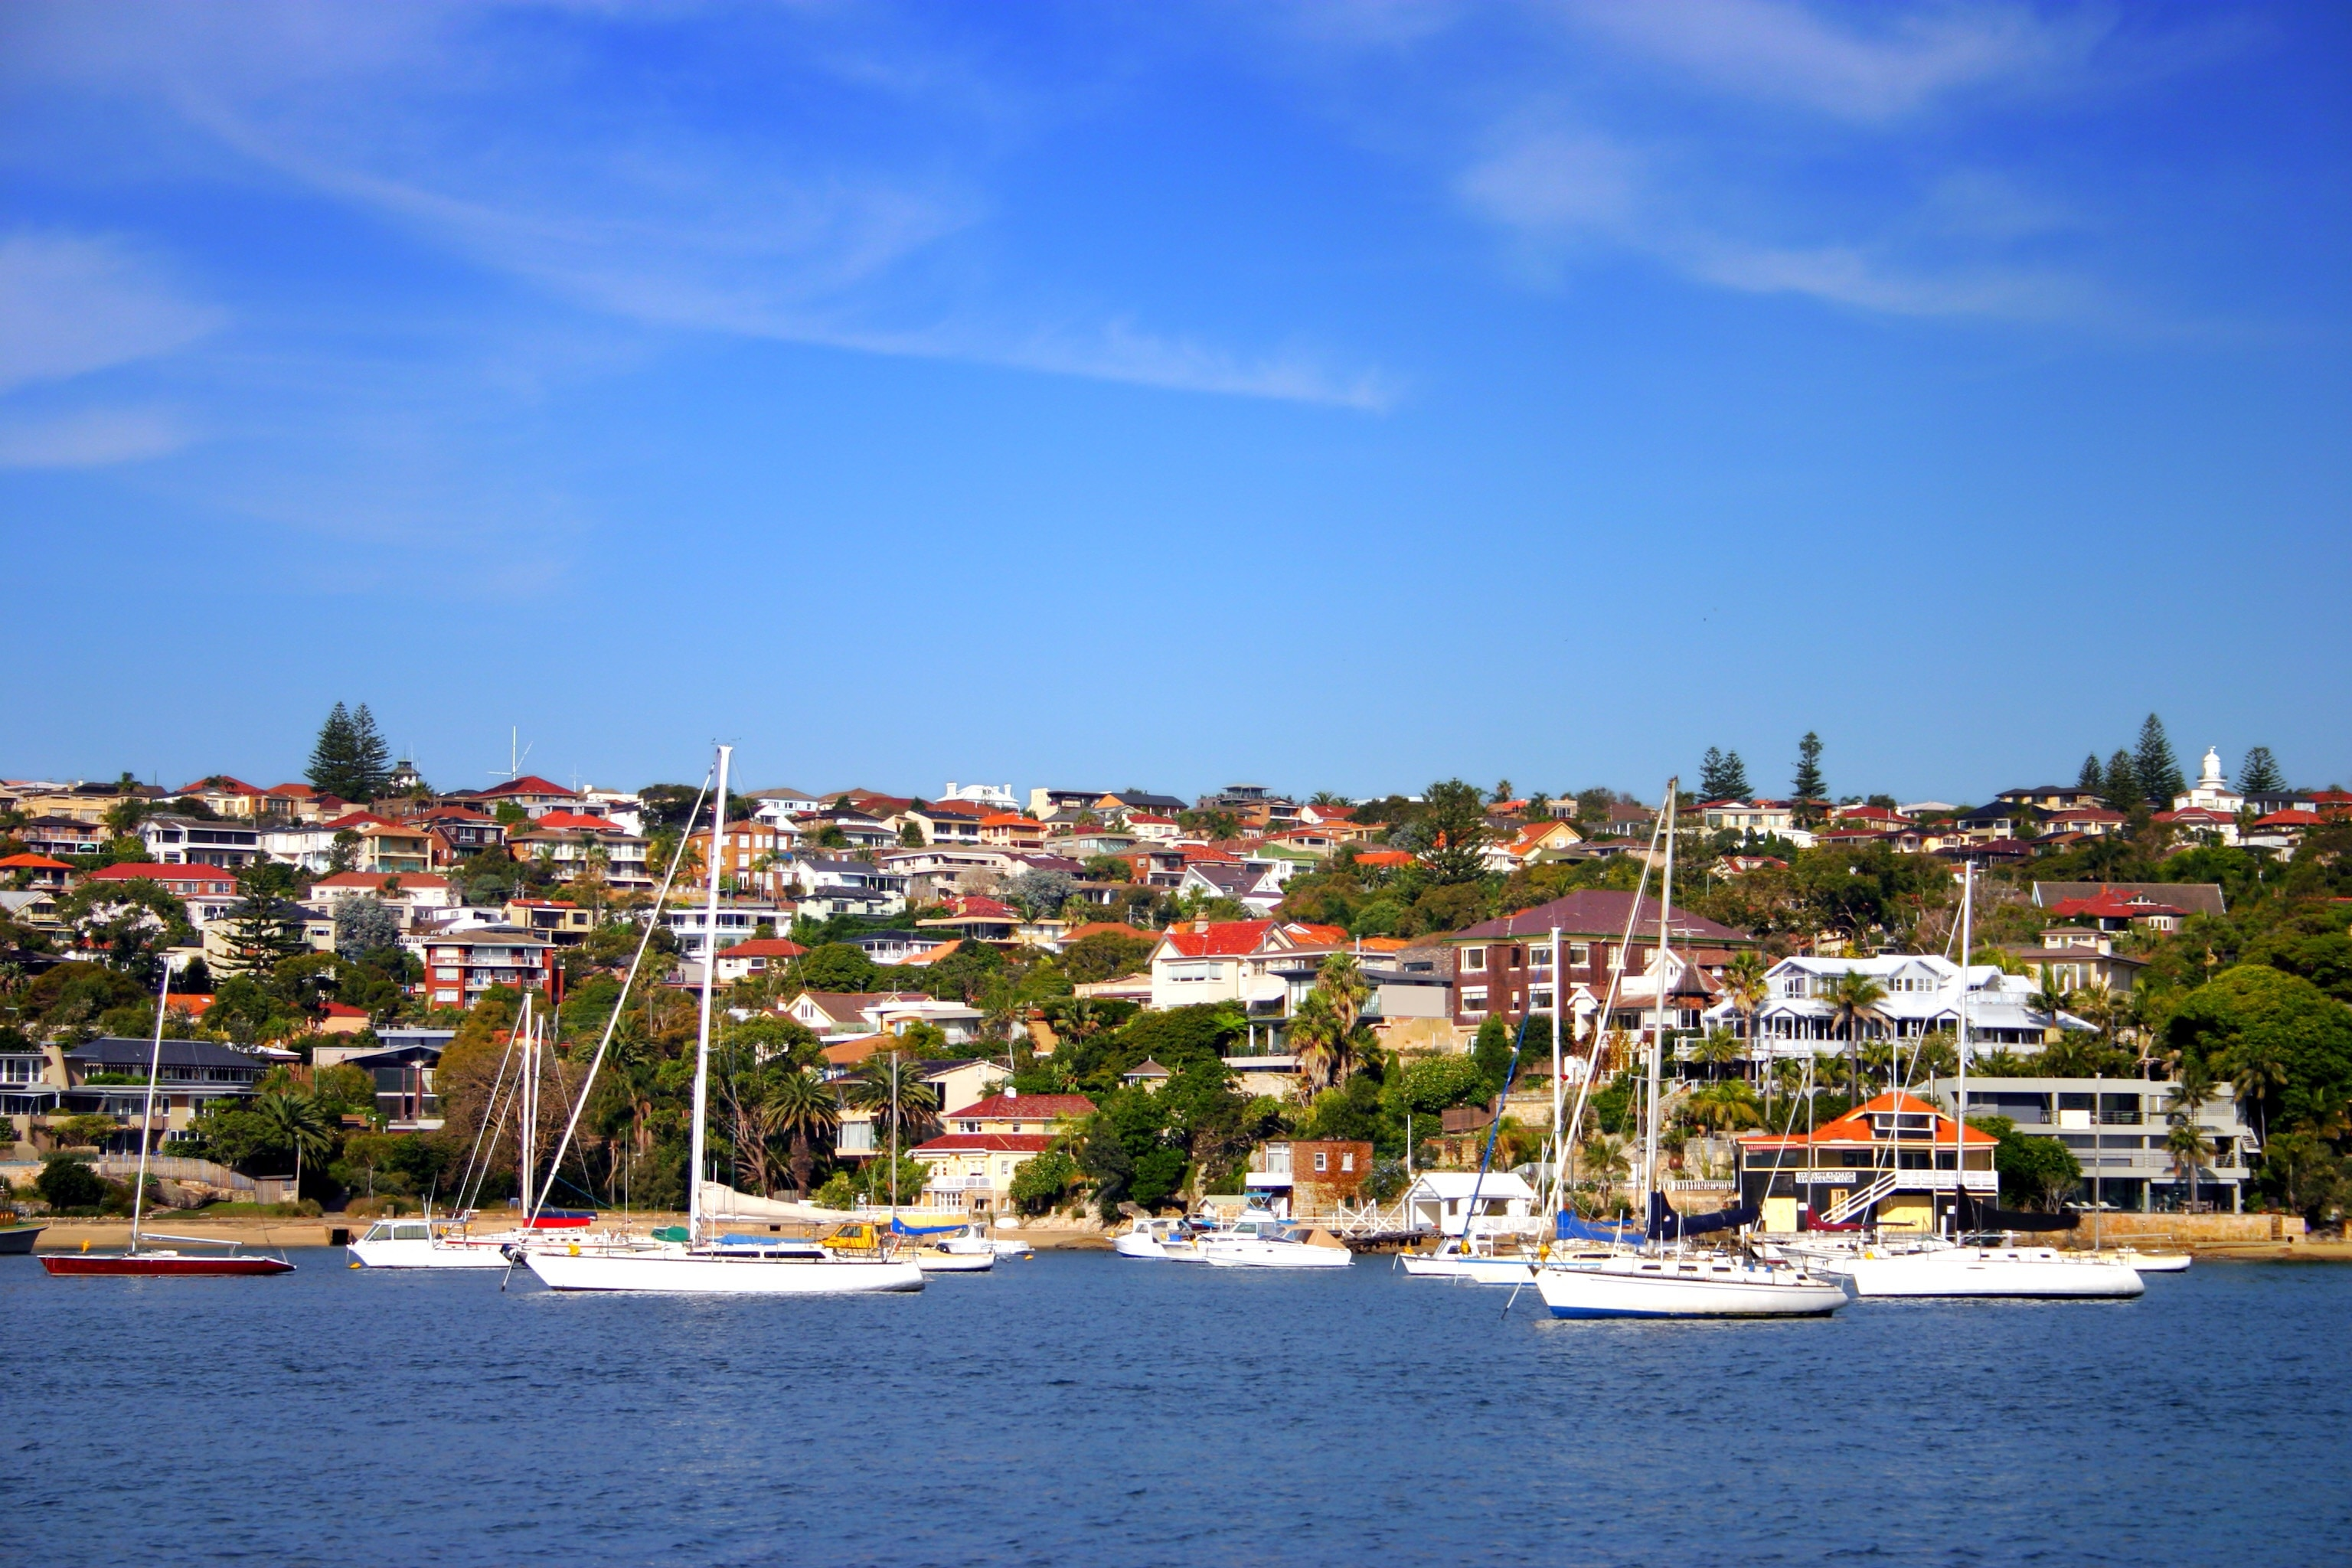 Randwick, Sydney, New South Wales, Australia